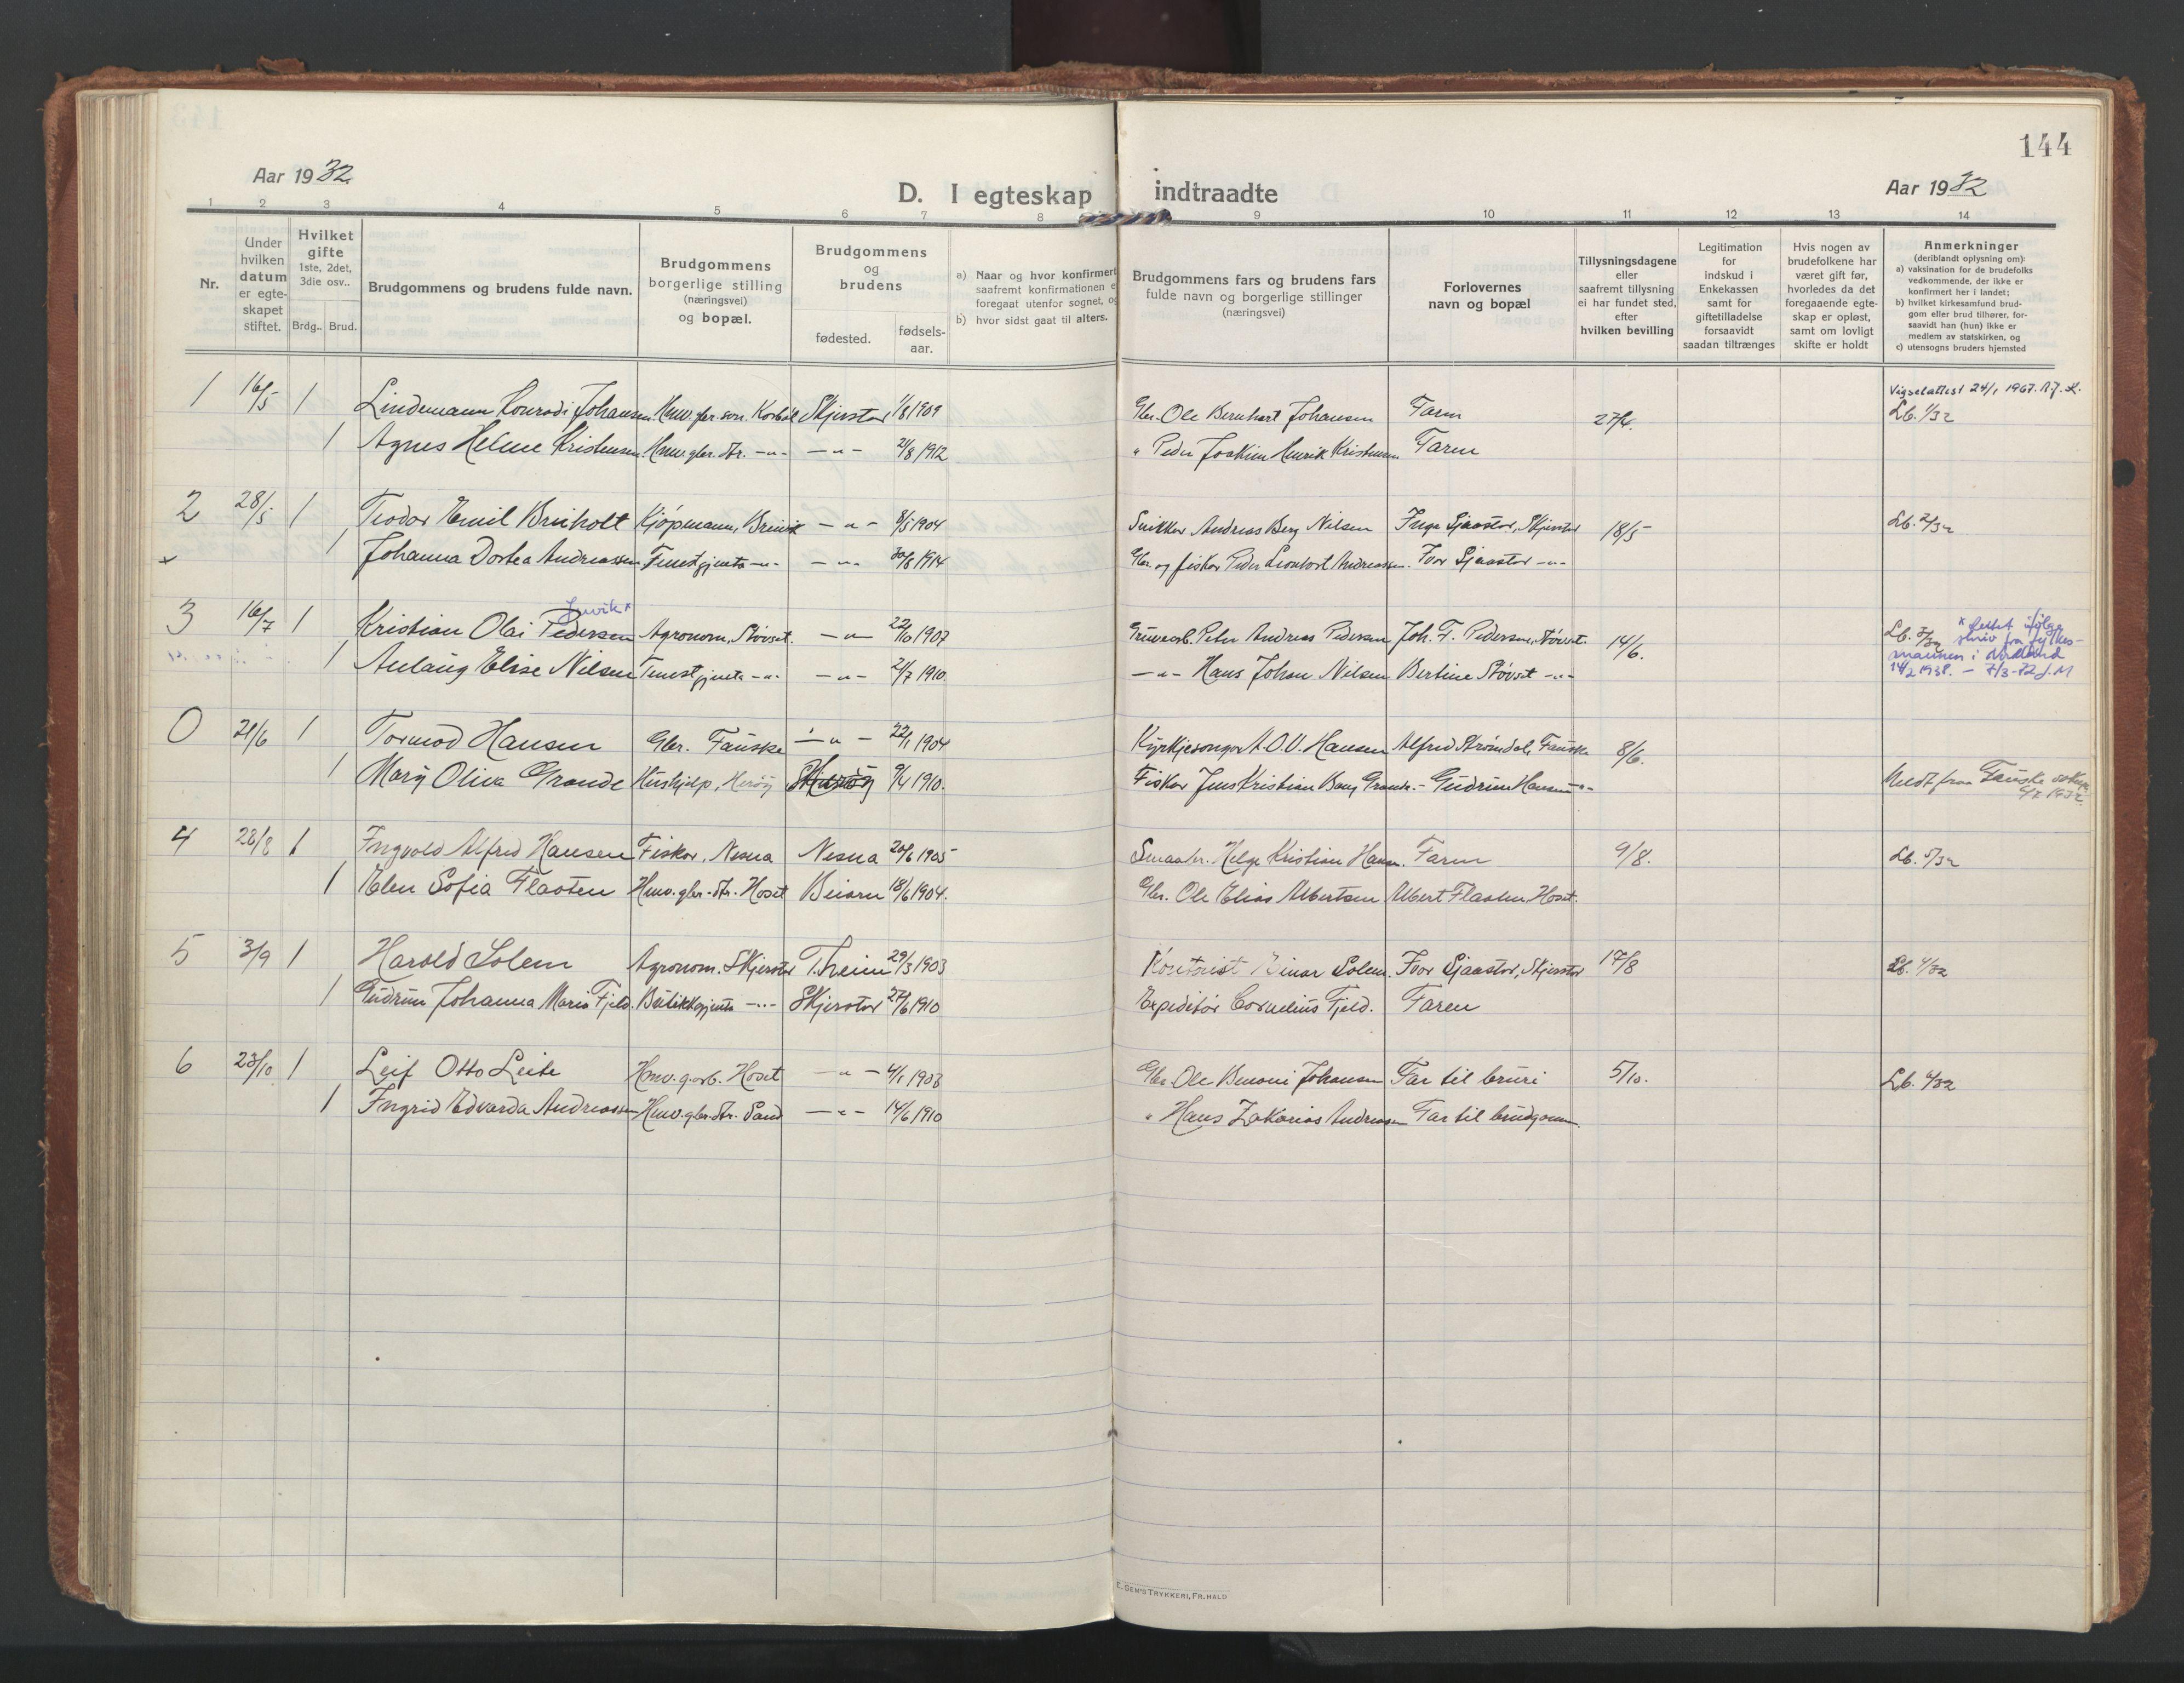 SAT, Ministerialprotokoller, klokkerbøker og fødselsregistre - Nordland, 852/L0748: Ministerialbok nr. 852A18, 1913-1932, s. 144